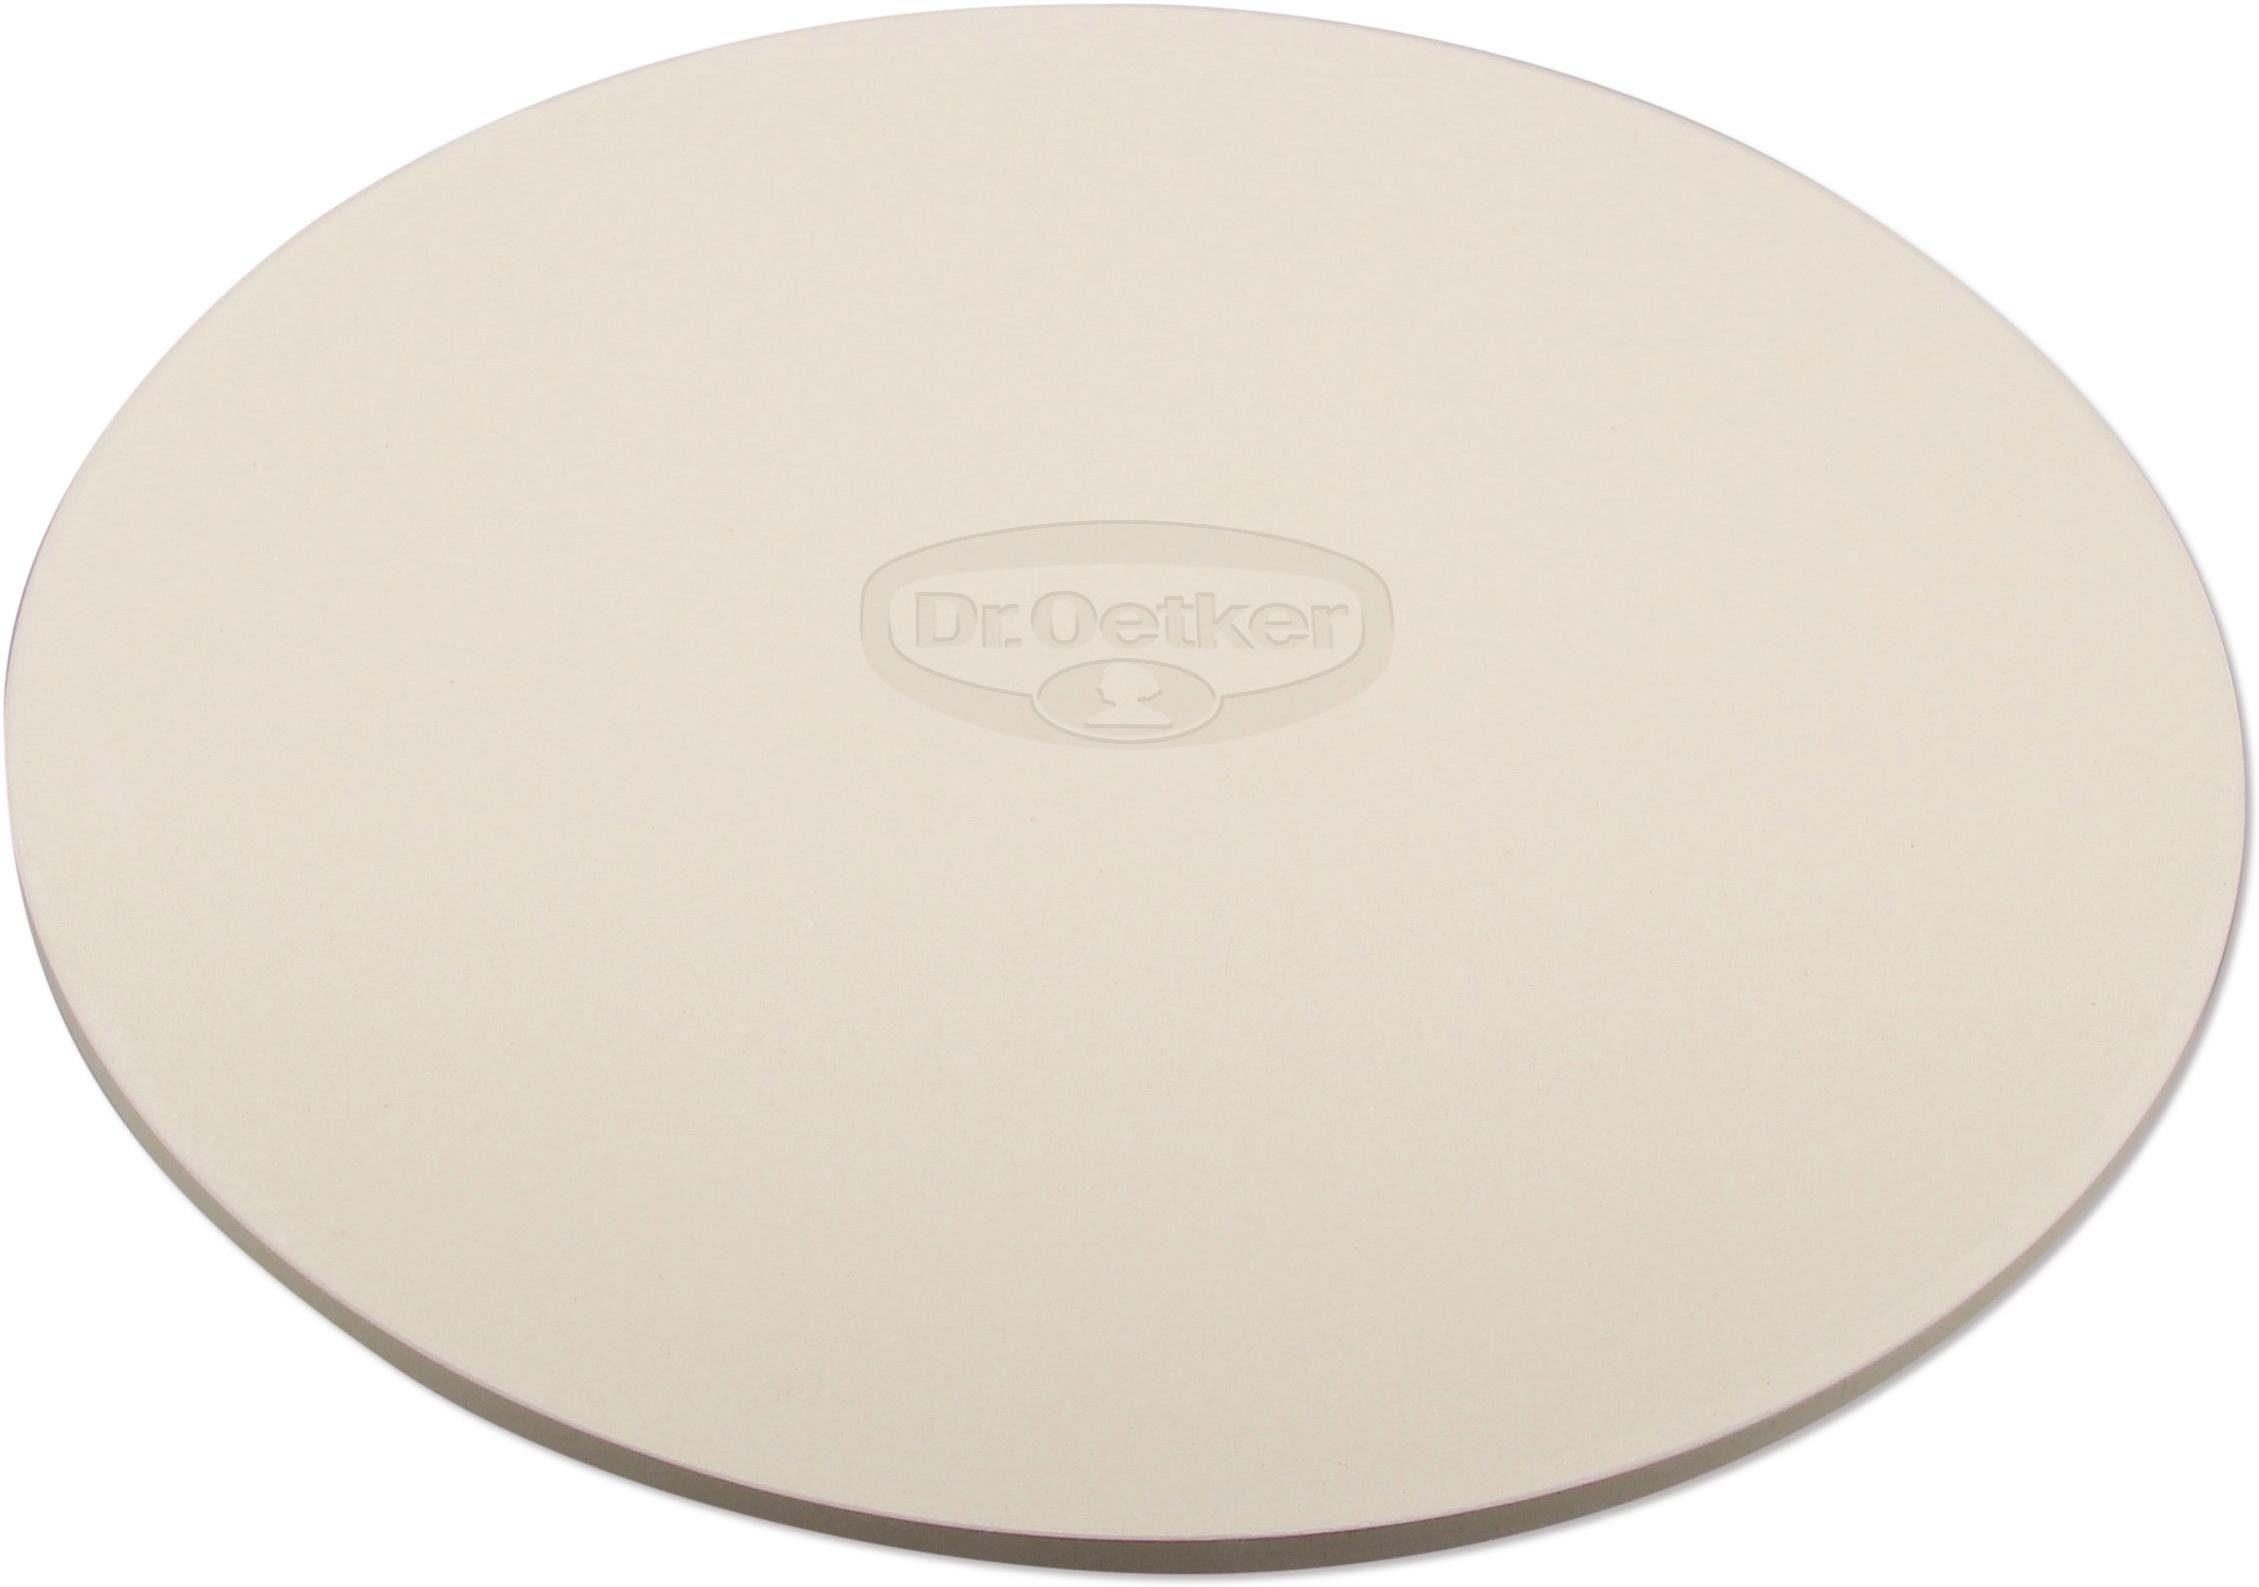 Dr. Oetker Pizzastein, Keramik, Ø 33 cm